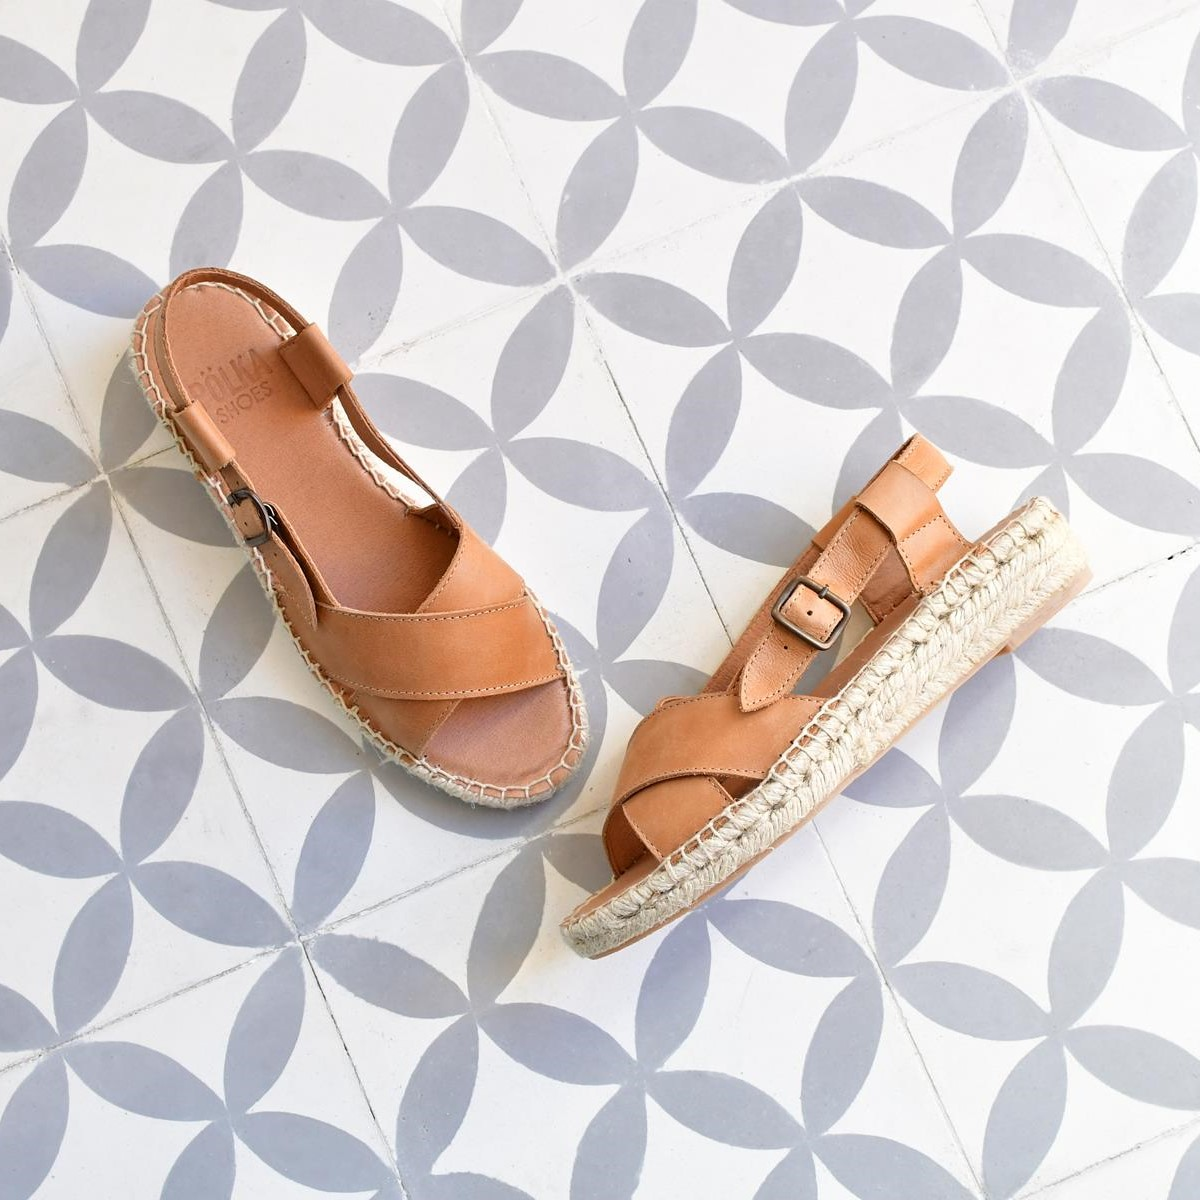 740bdbf1d2 AmorShoes | Sneakers & Calzado Made in Spain para tod@s | Page 4